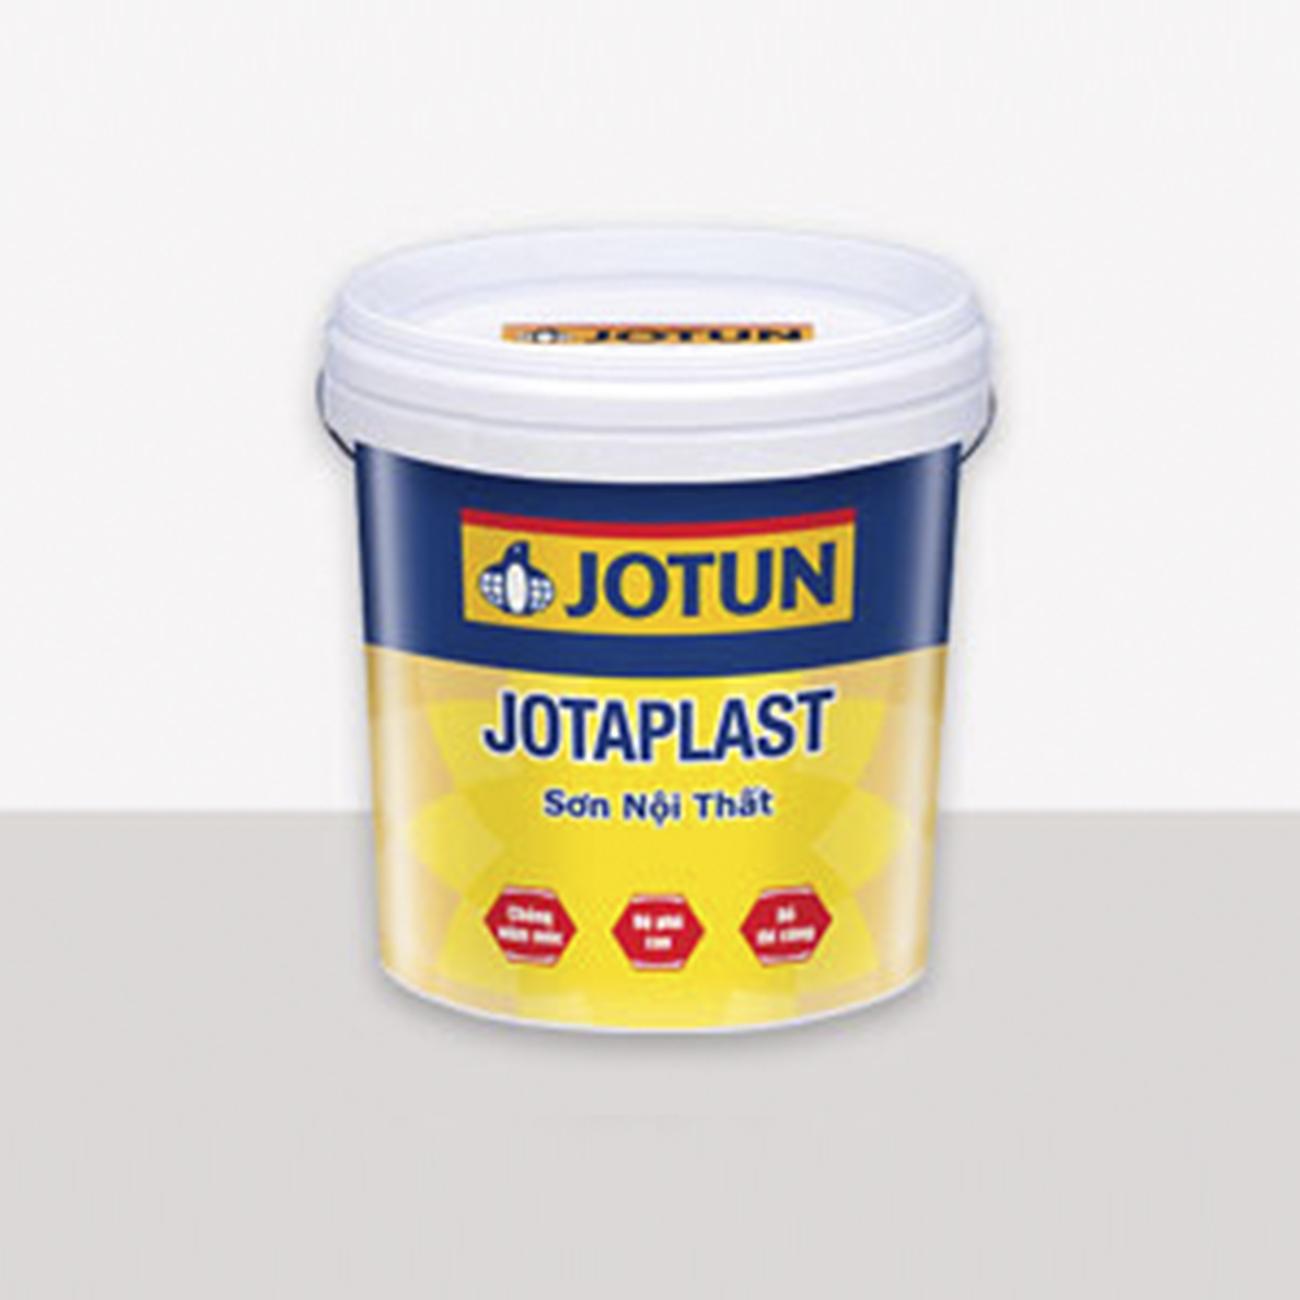 Sơn nội thất Jotun Jotaplast 5 Lít